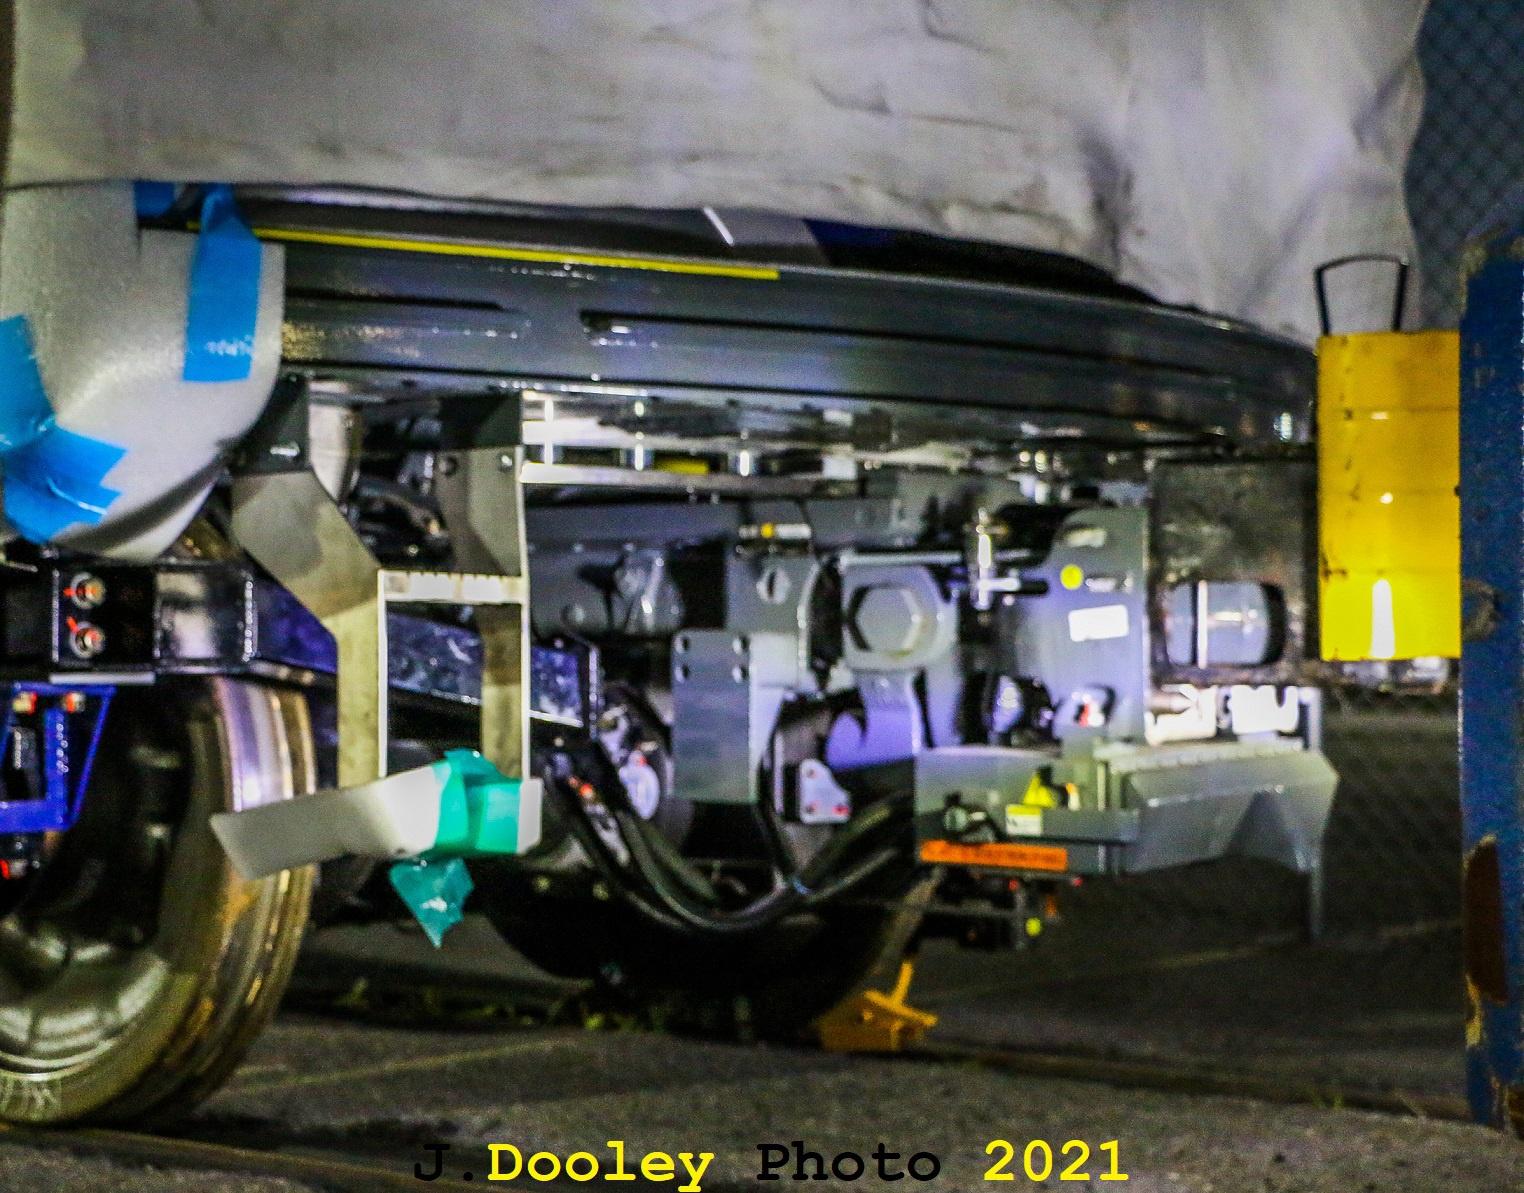 (771k, 1524x1193)<br><b>Country:</b> United States<br><b>City:</b> New York<br><b>System:</b> New York City Transit<br><b>Car:</b> R-211 (Kawasaki, 2021-)  <br><b>Photo by:</b> John Dooley<br><b>Date:</b> 6/29/2021<br><b>Notes:</b> R-211 delivery and press conference.<br><b>Viewed (this week/total):</b> 3 / 251